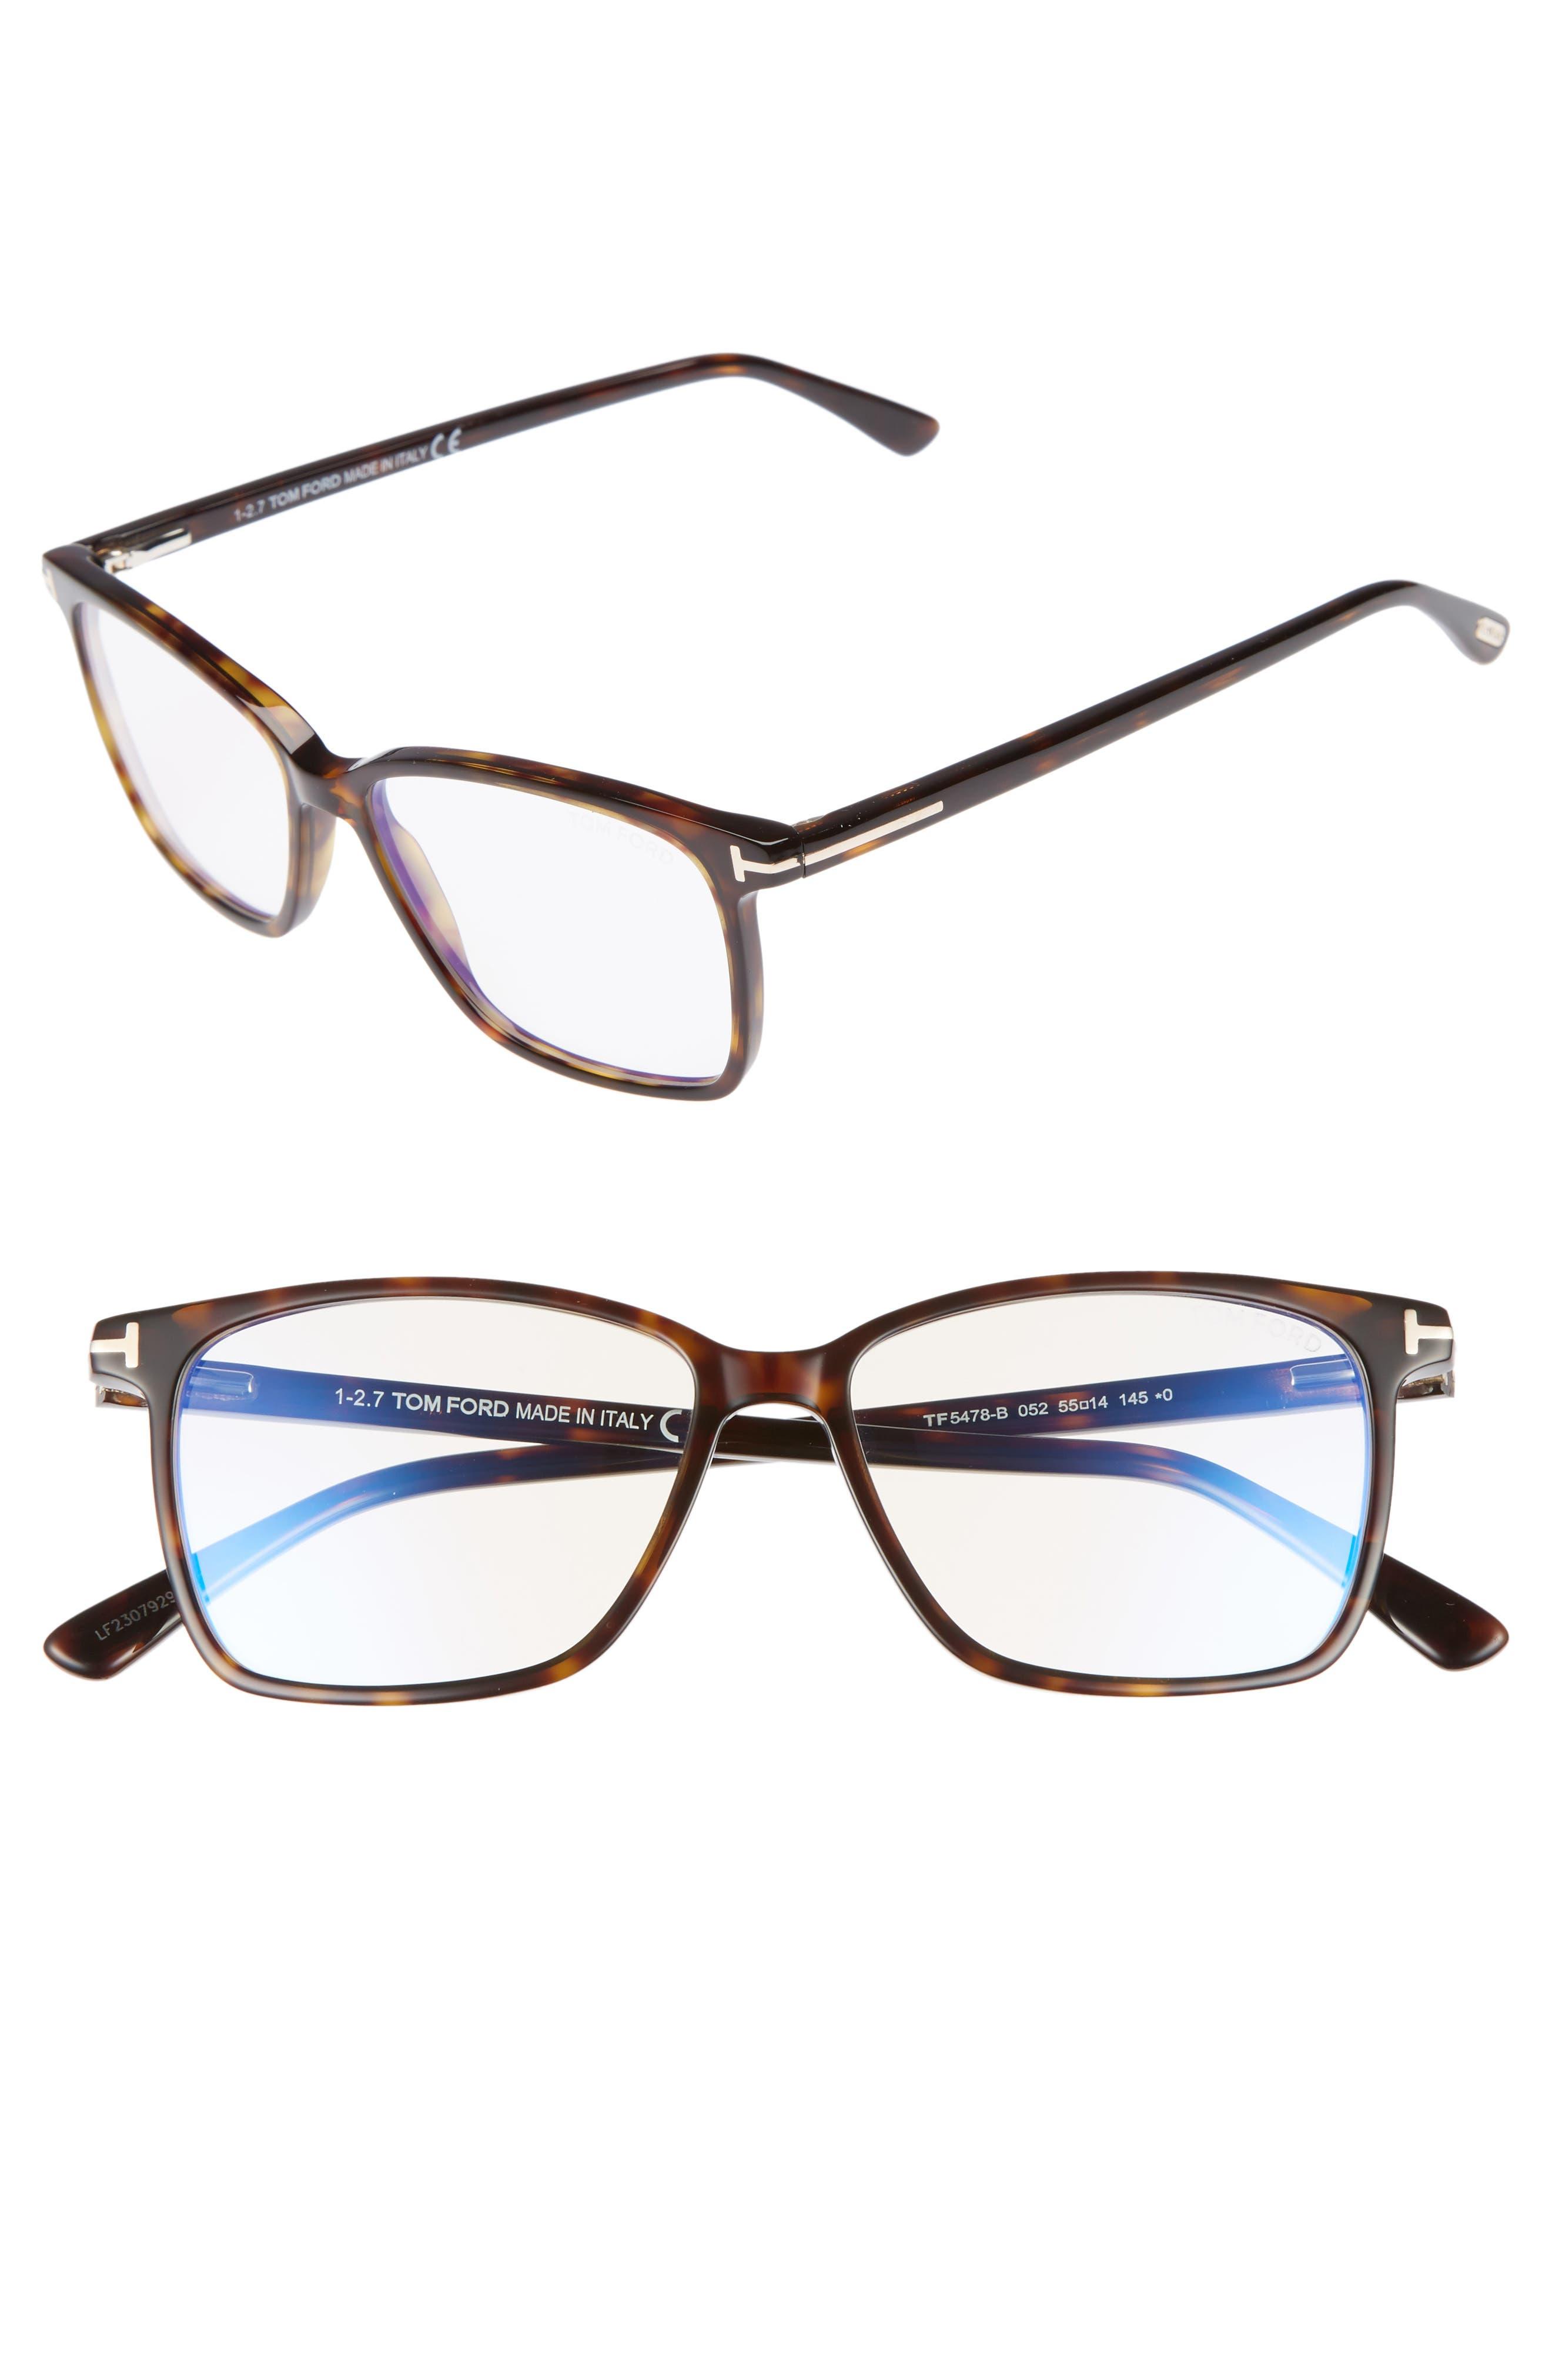 55mm Blue Block Optical Glasses,                             Main thumbnail 1, color,                             DARK HAVANA/ BLUE